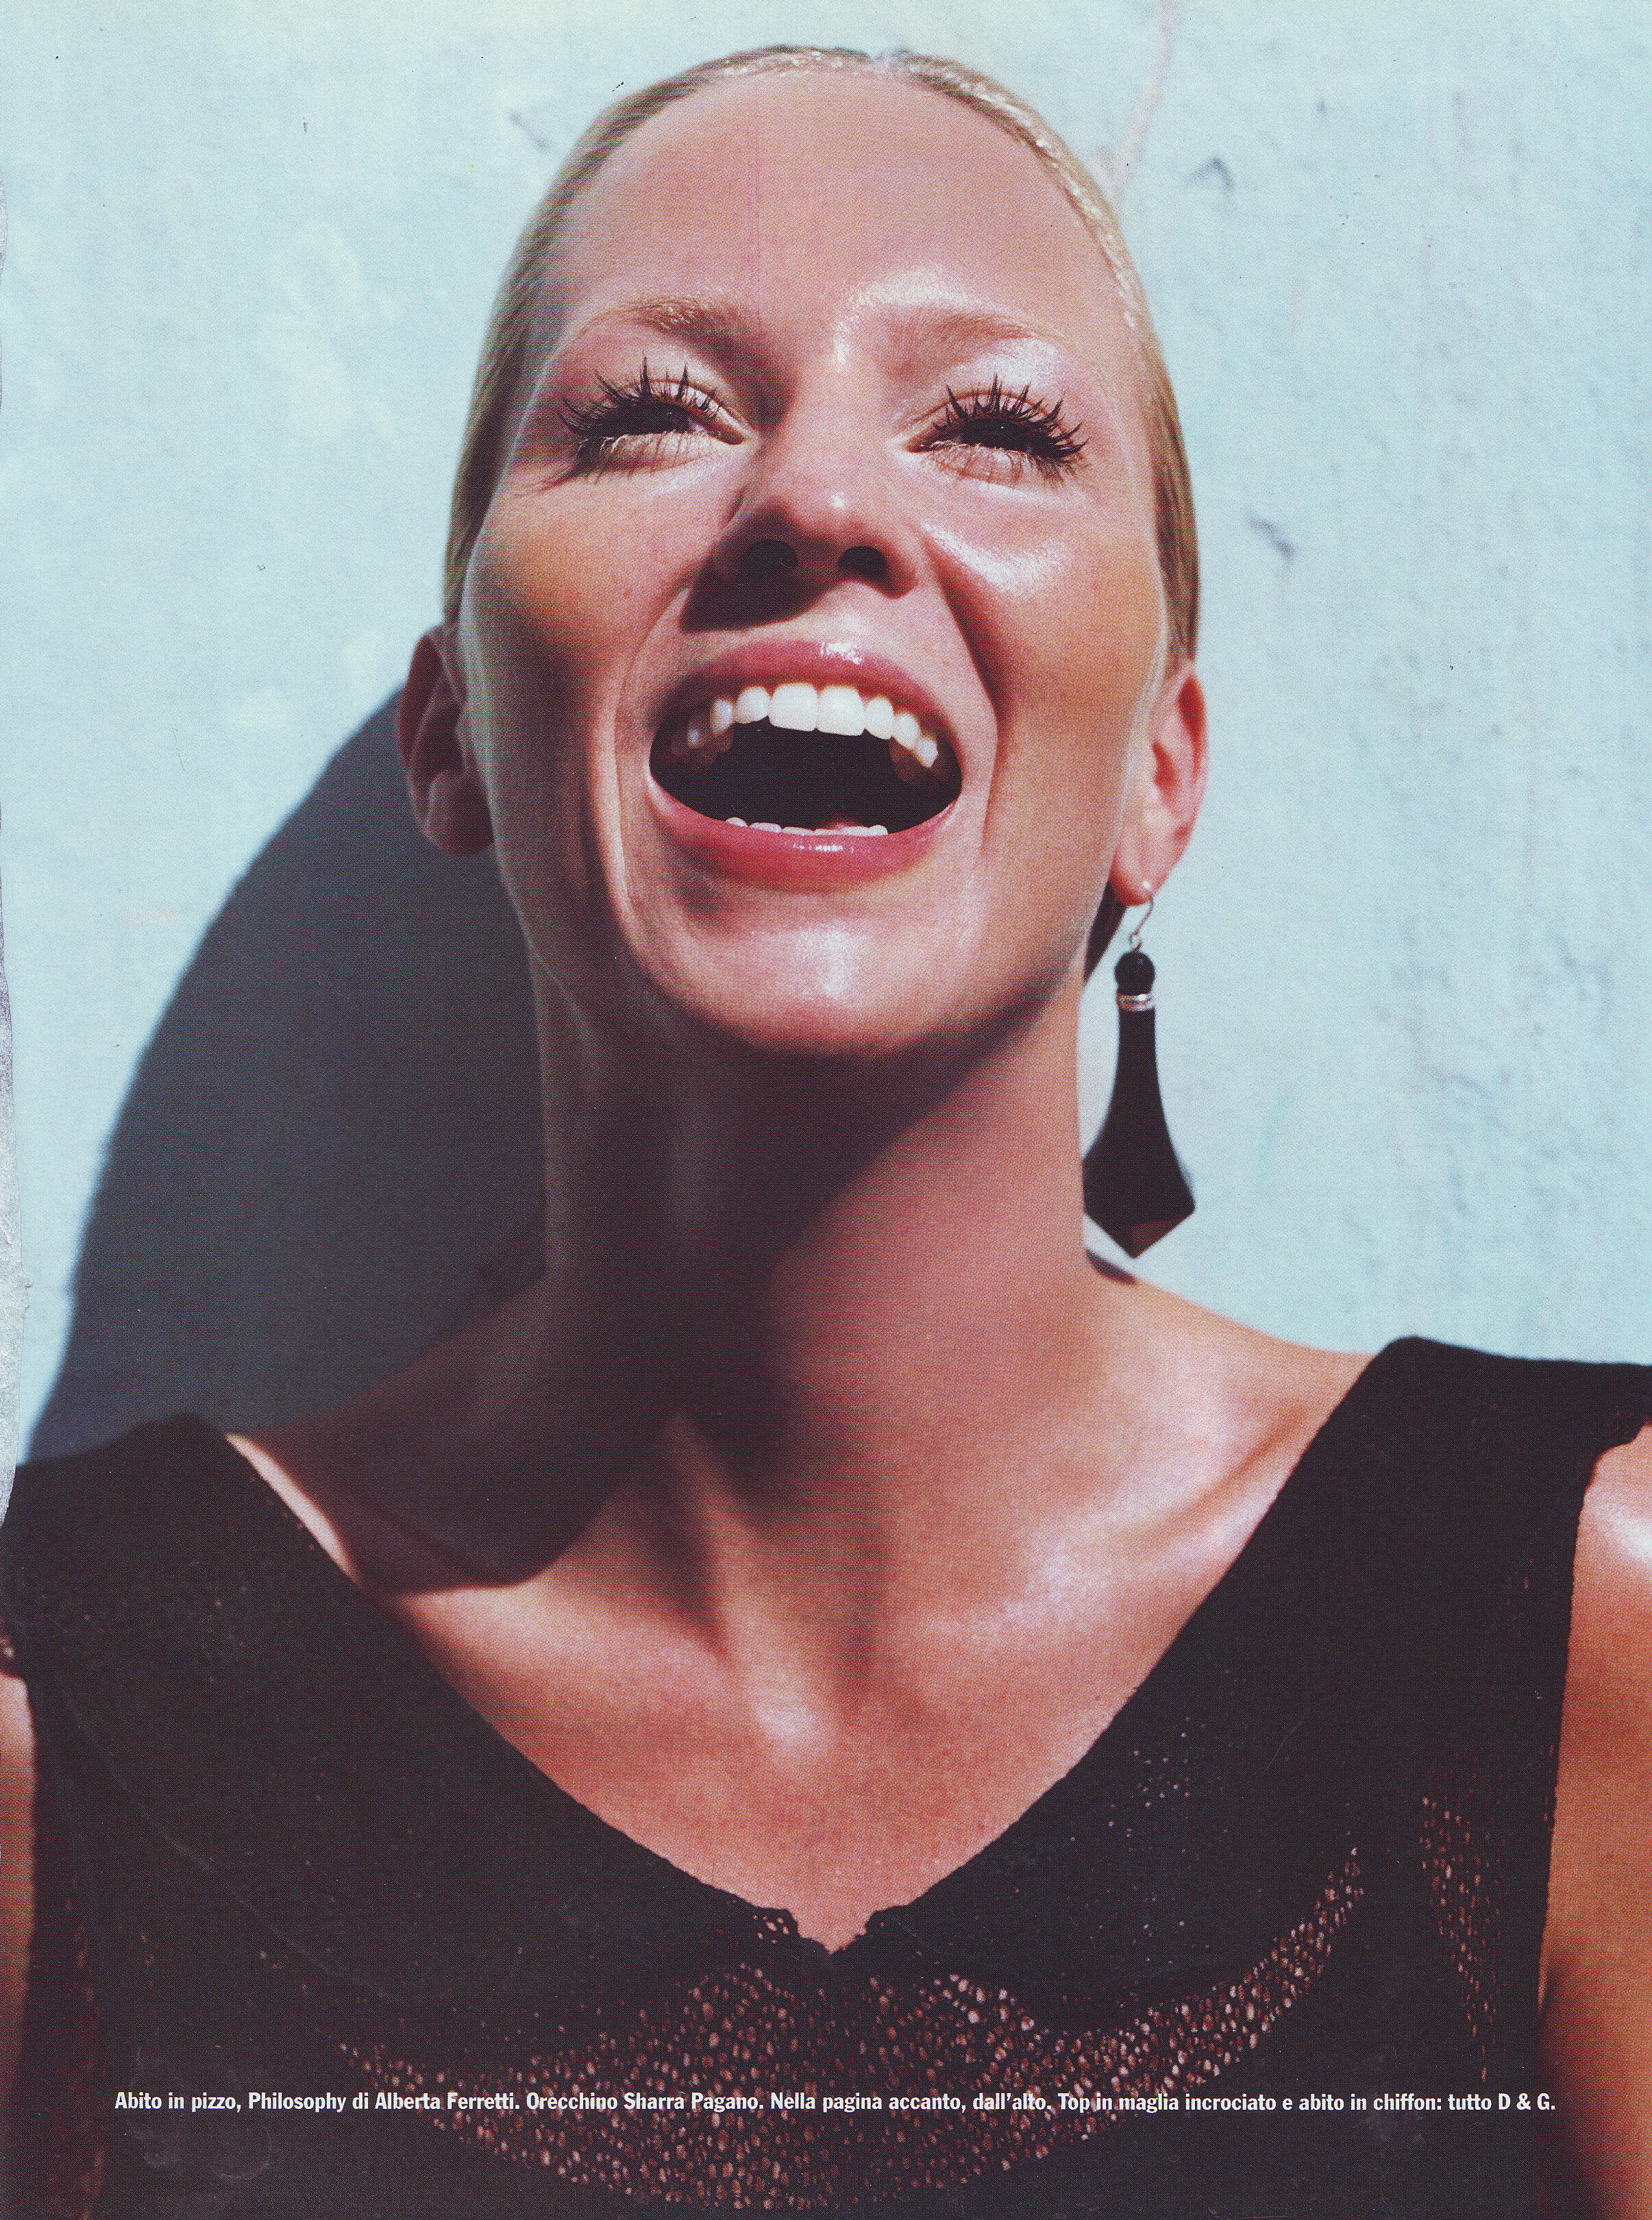 Heather Payne 1998 Heather Payne 1998 new photo